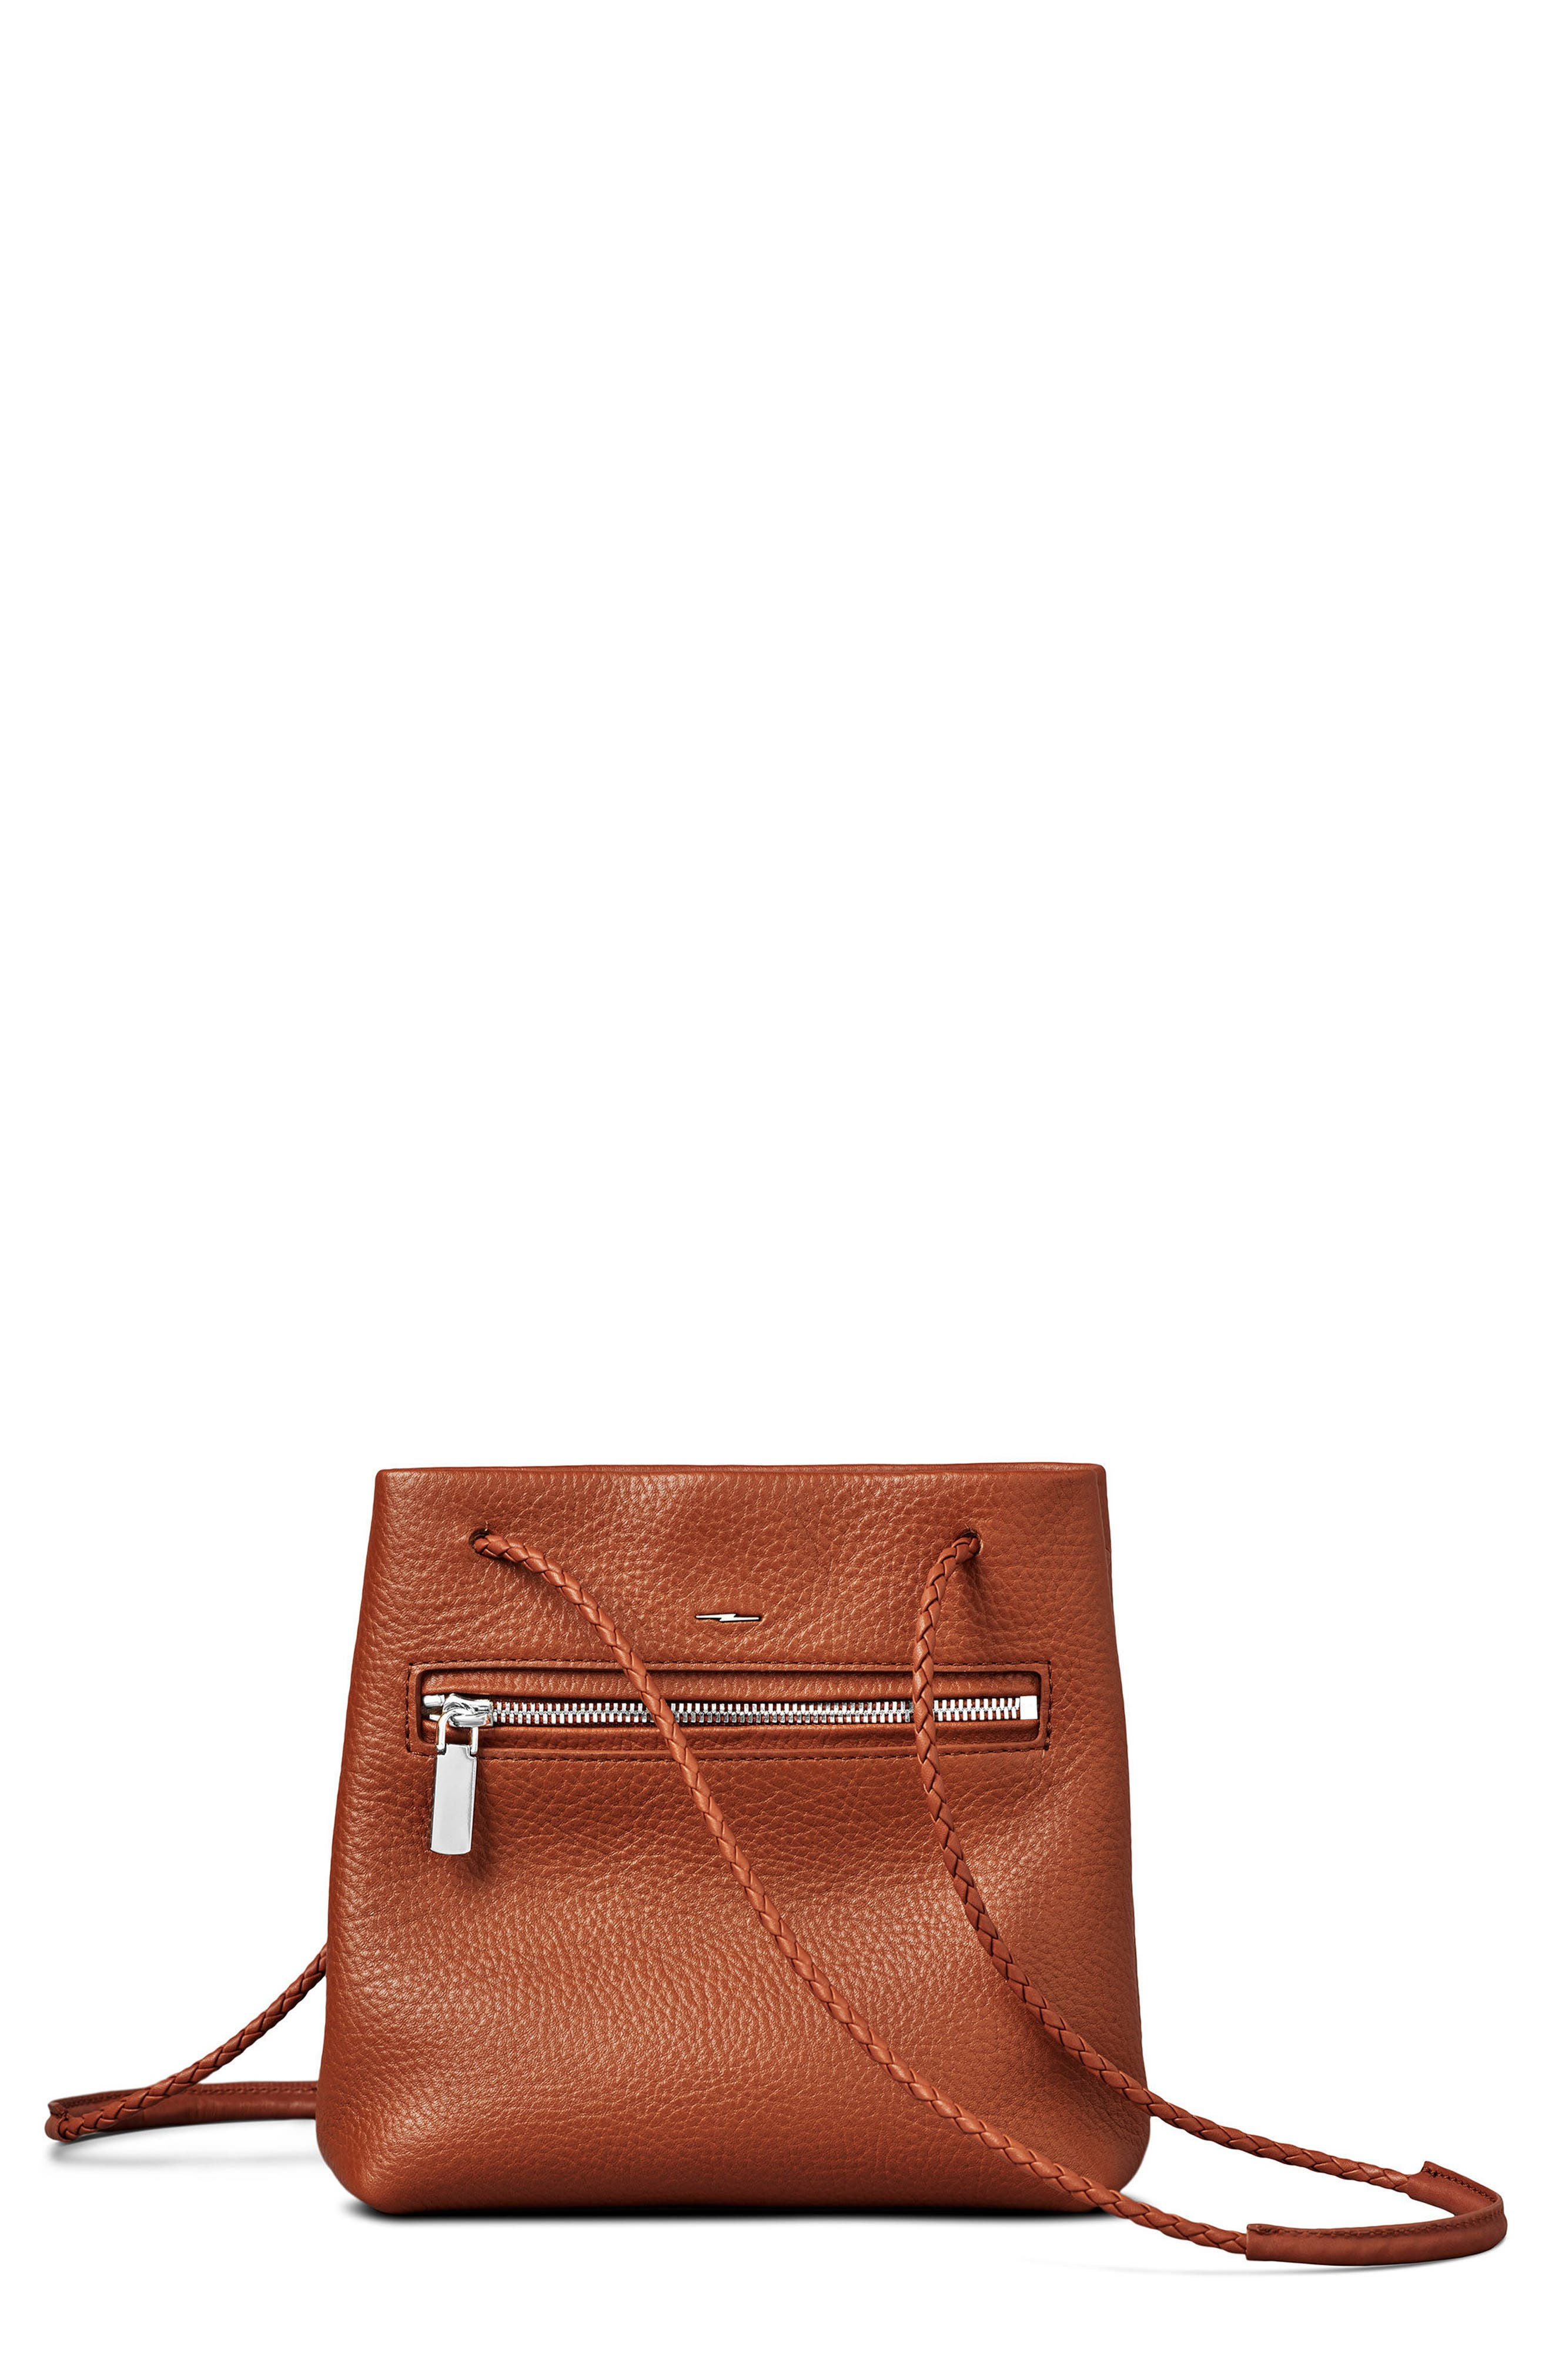 Mini Pebbled Leather Drawstring Crossbody Bag,                         Main,                         color, Bourbon